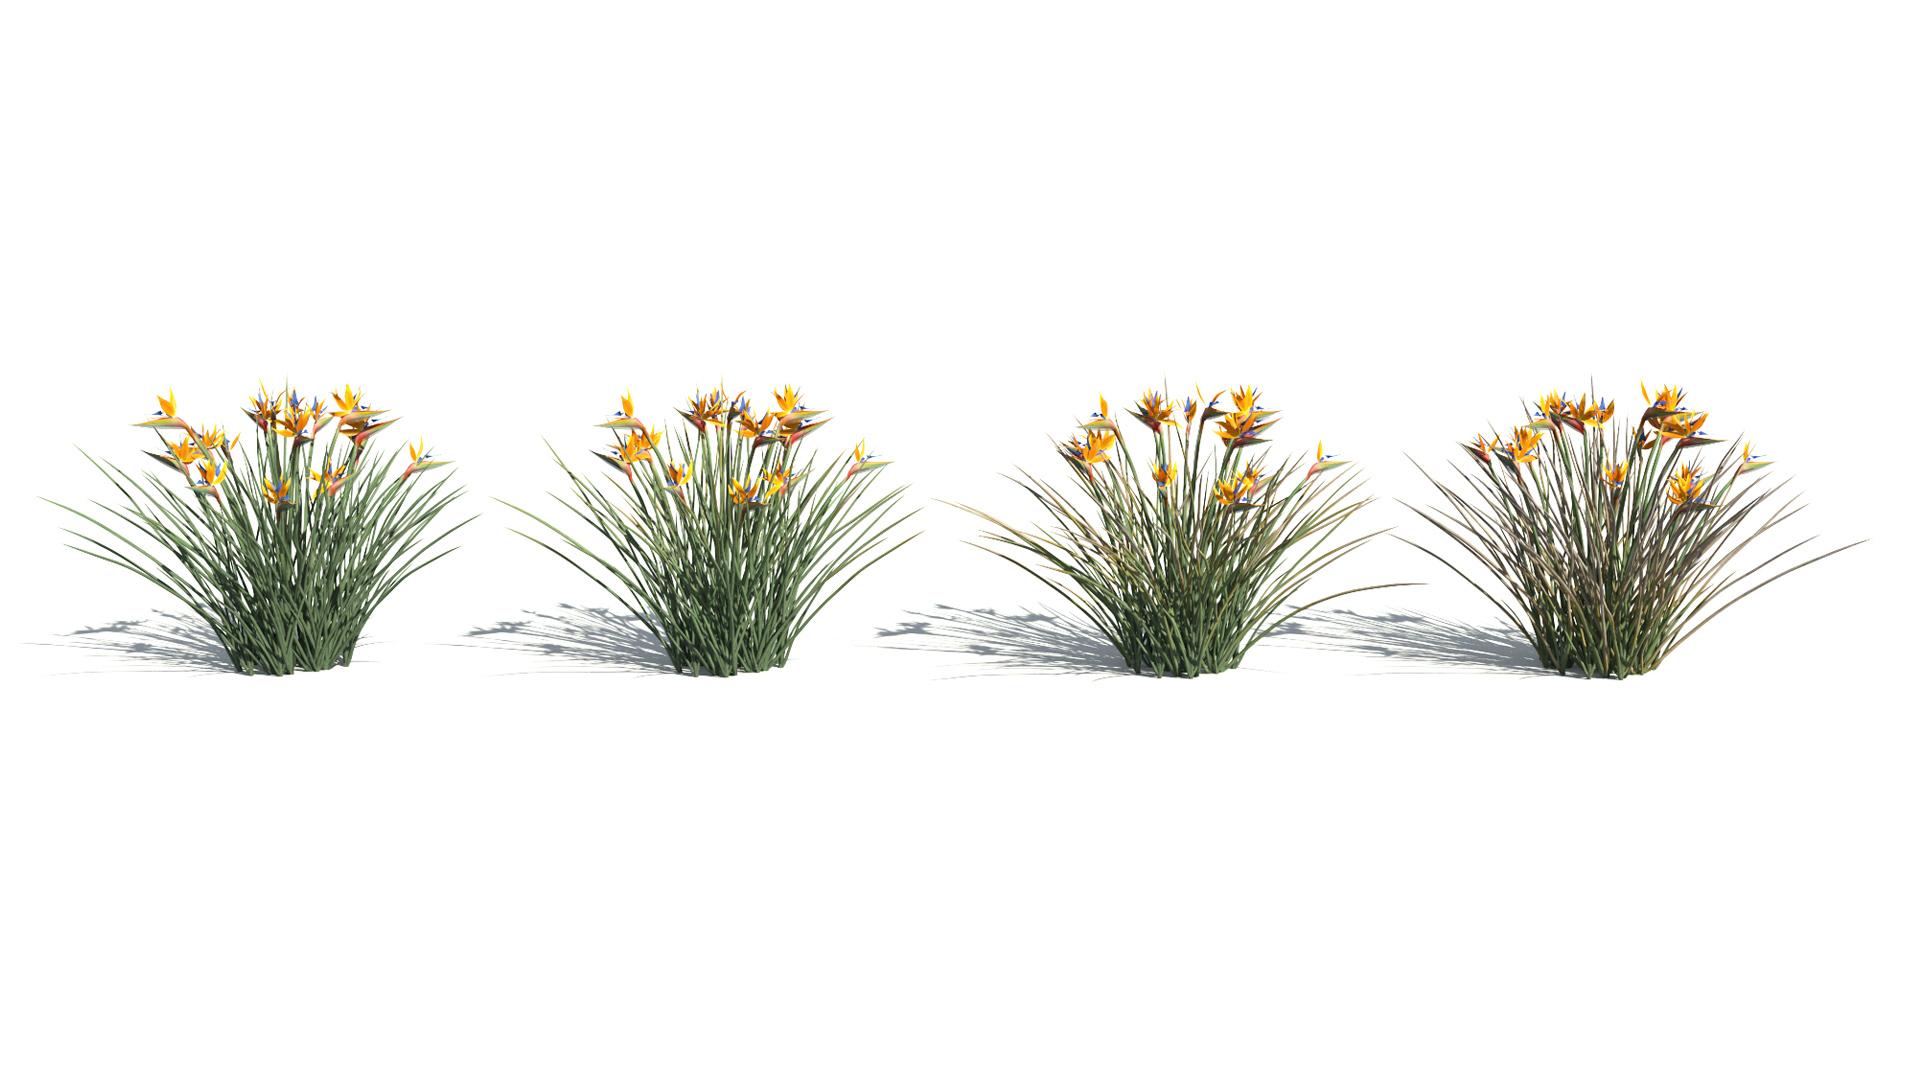 3D model of the Bird of paradise Strelitzia reginae health variations